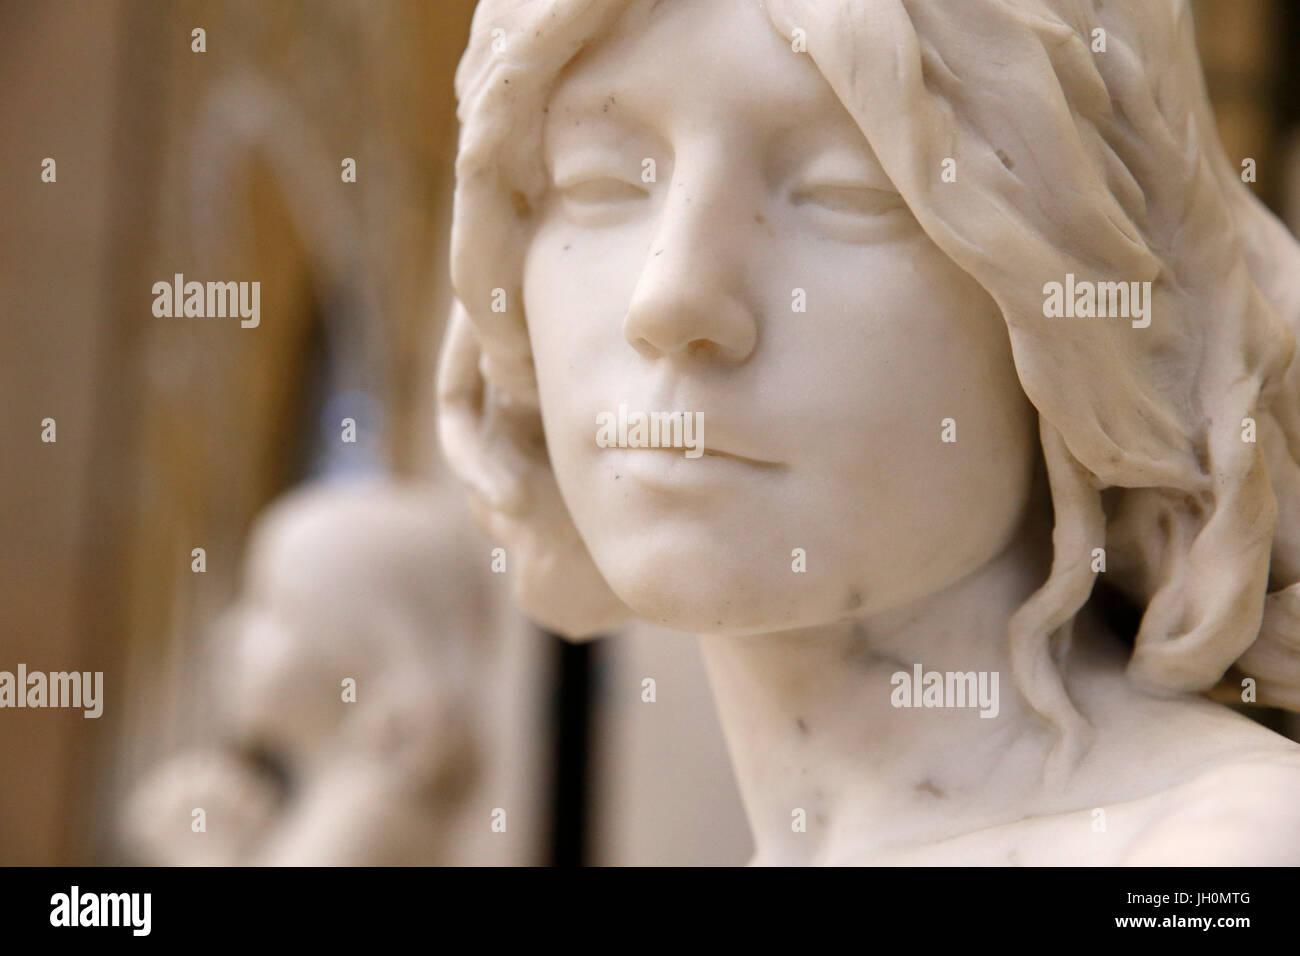 Orsay museum. Alfred Charles Lenoir. Saint John the Baptist. Marble. 1883. Paris. France. - Stock Image